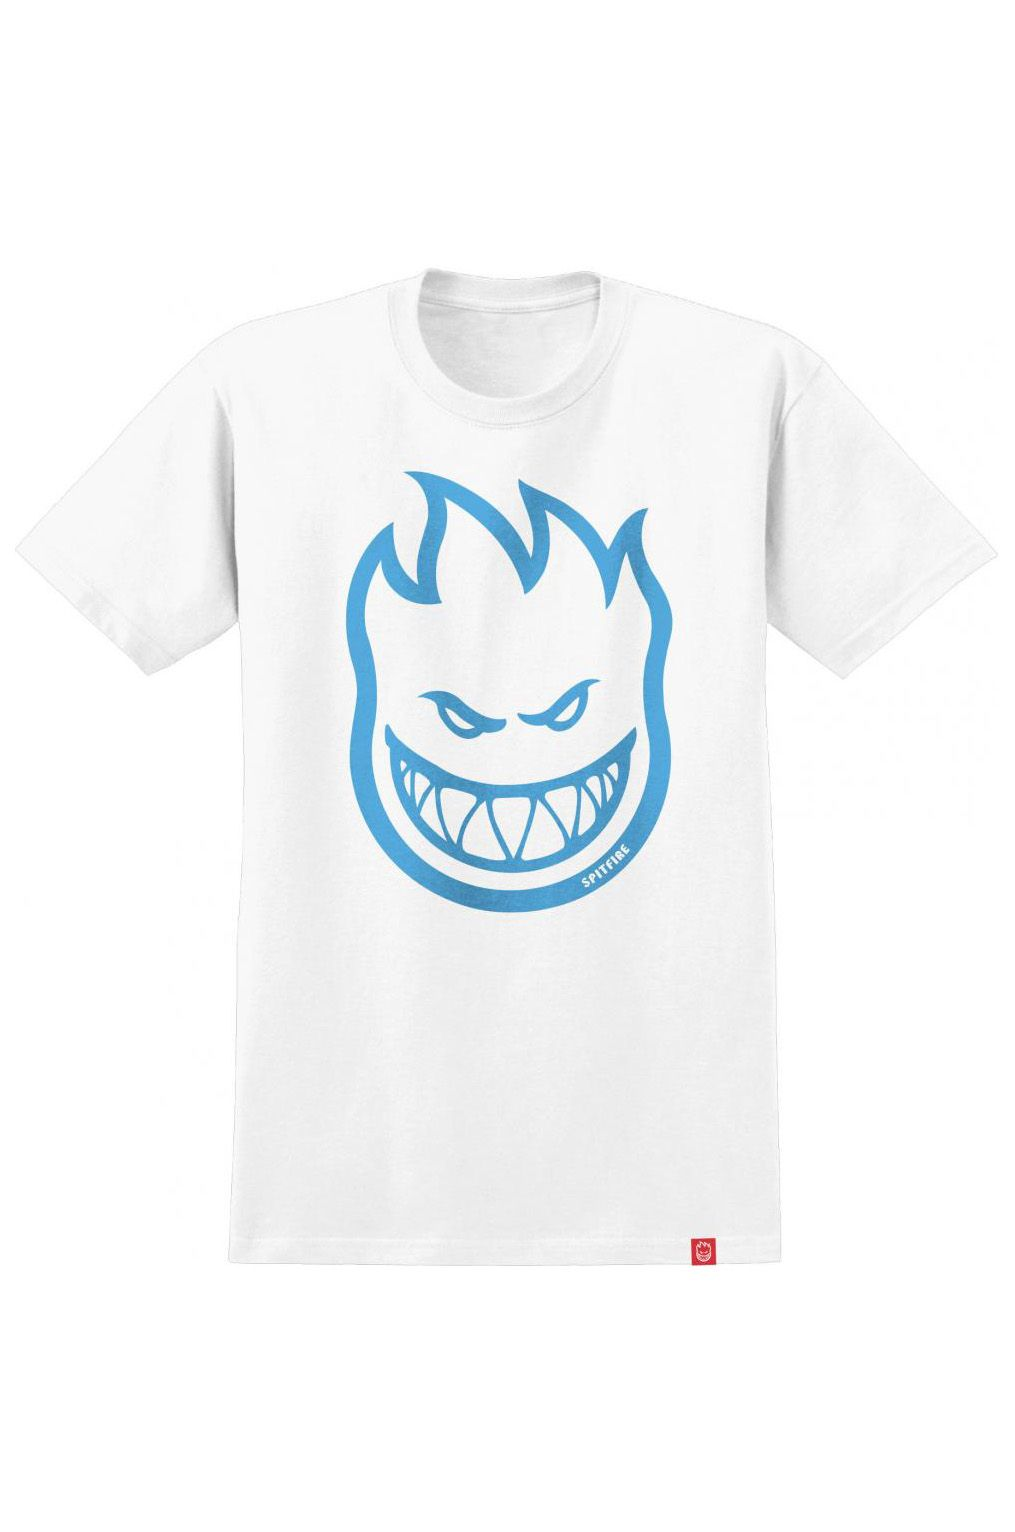 T-Shirt Spitfire BIGHEAD White/Lt Blue